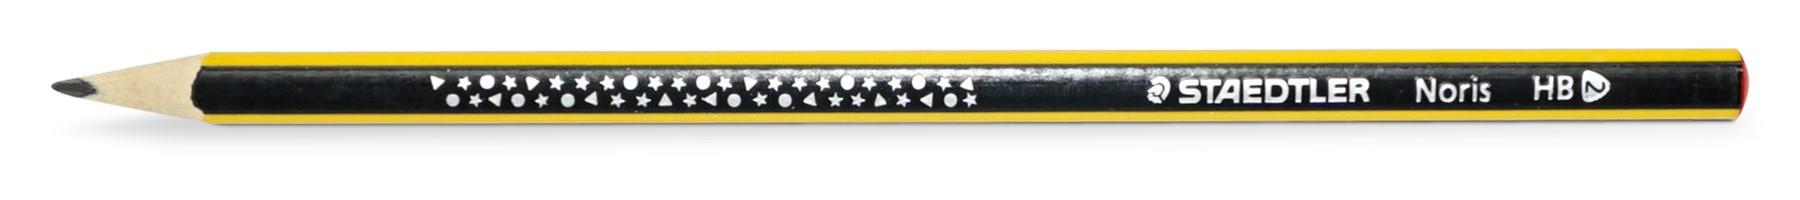 Staedtler Wopex Eco Noris Bleistift, dreikant